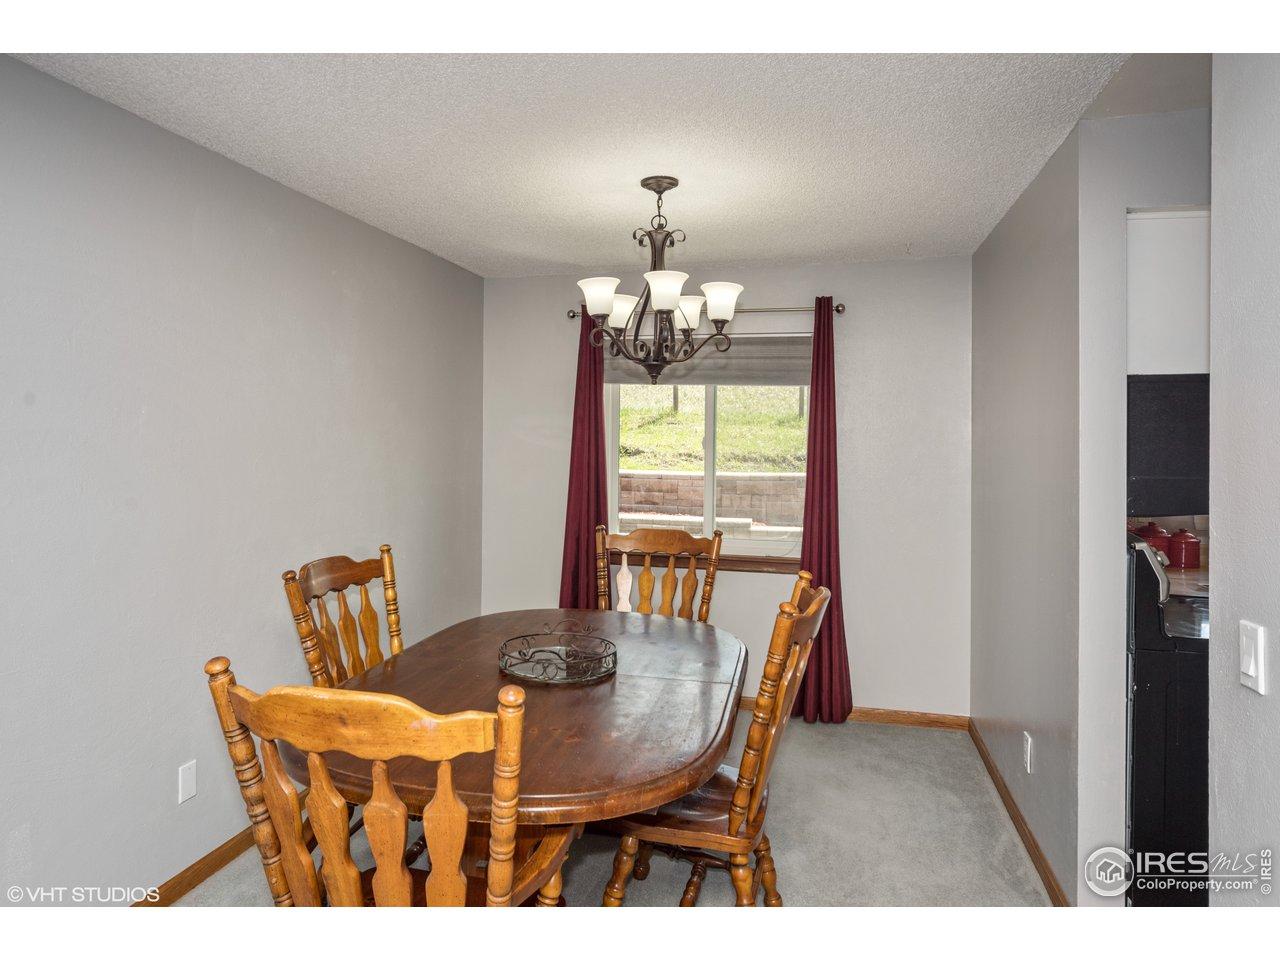 Formal dining room, updated lighting